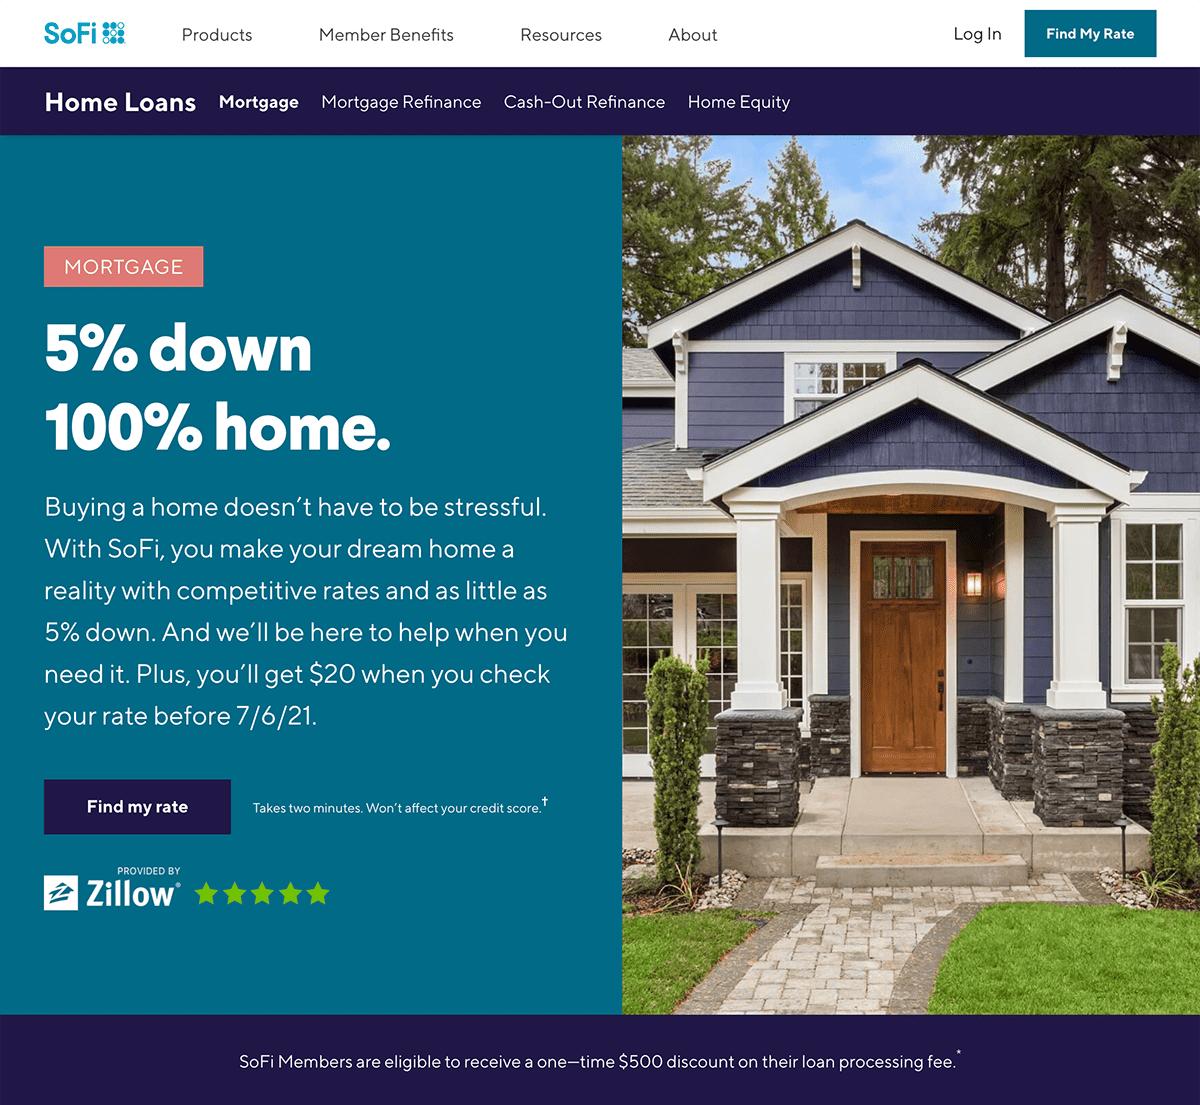 SoFi mortgage landing page example